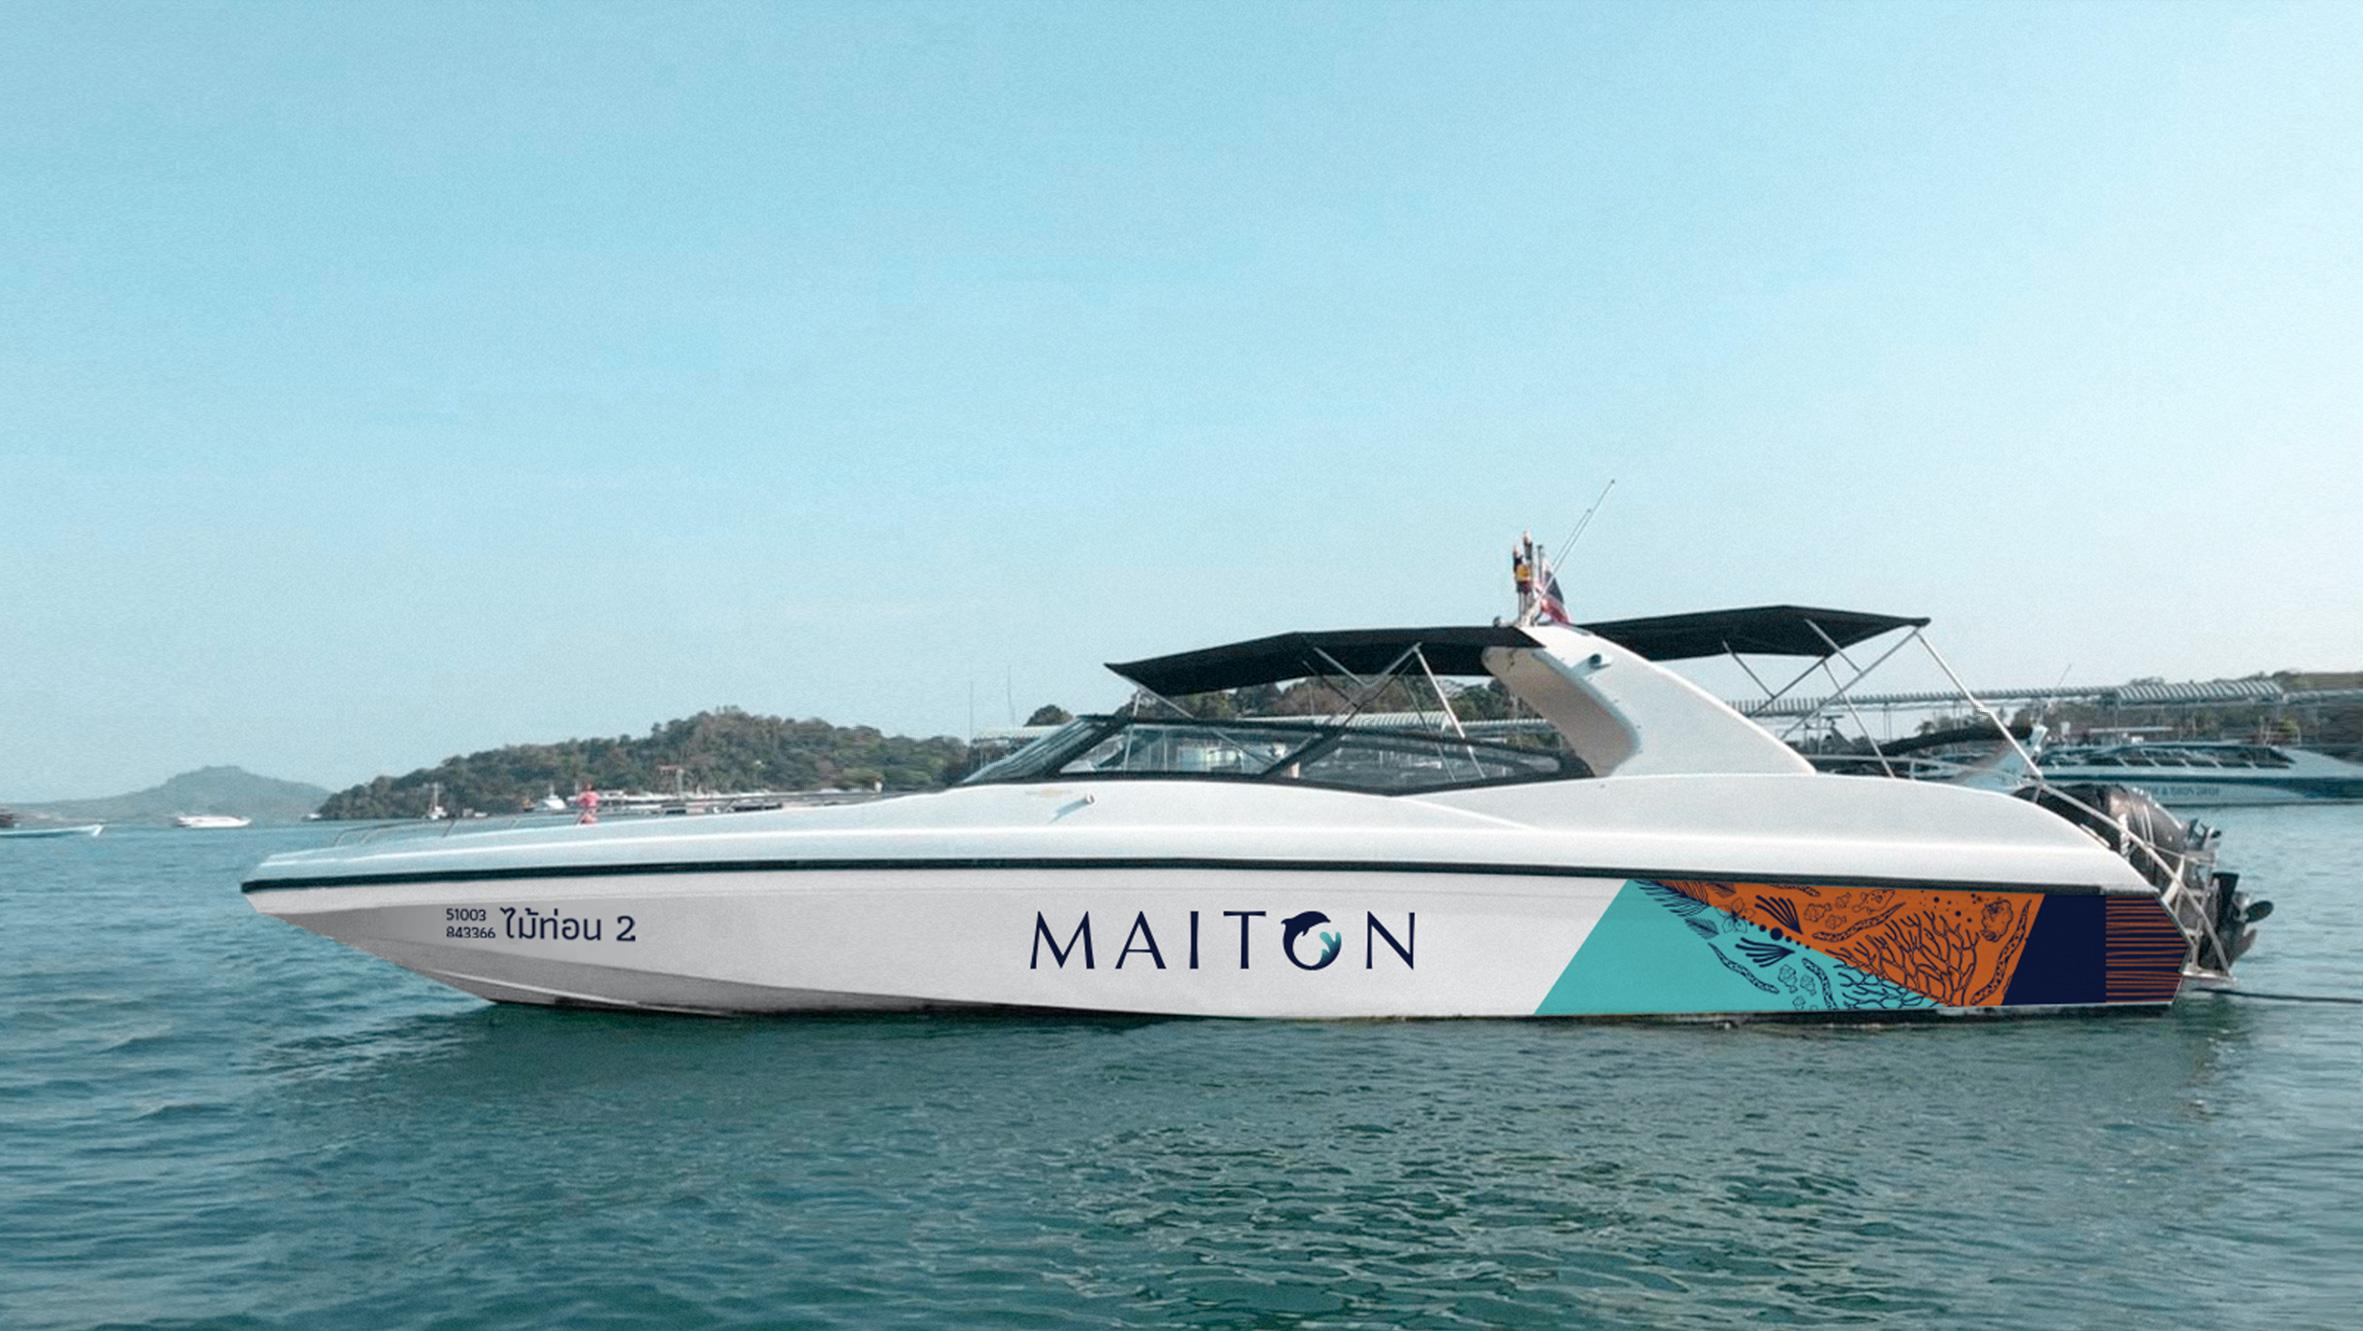 Speed boat | Maiton | Simplisis Design Studio | Branding Design Agency in Phuket